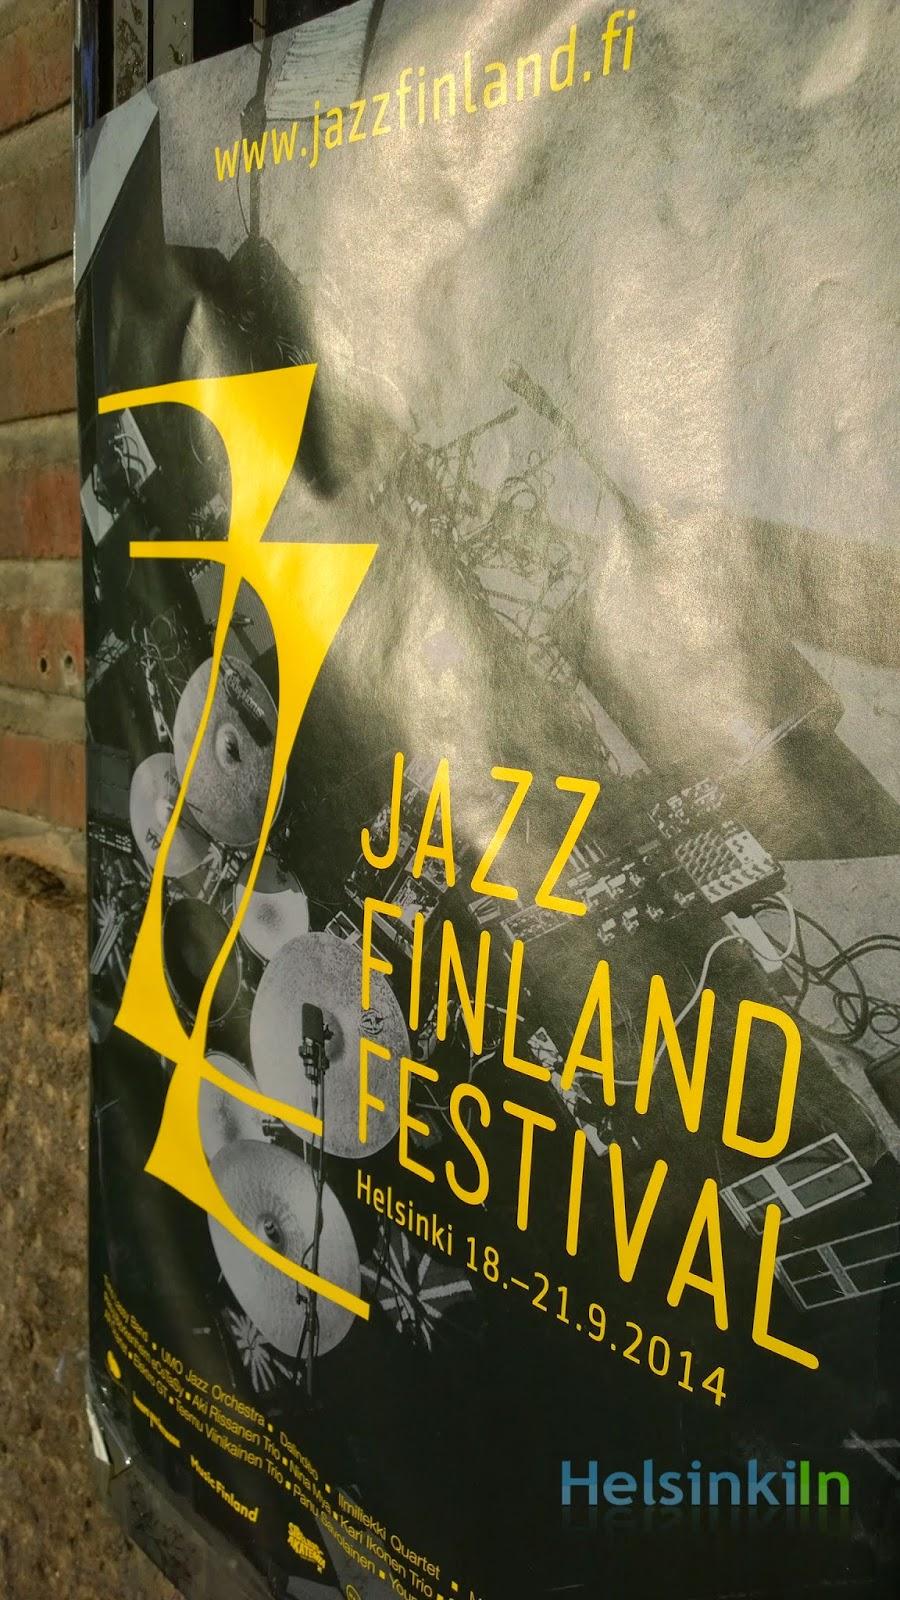 Jazz Finland Festival 2014